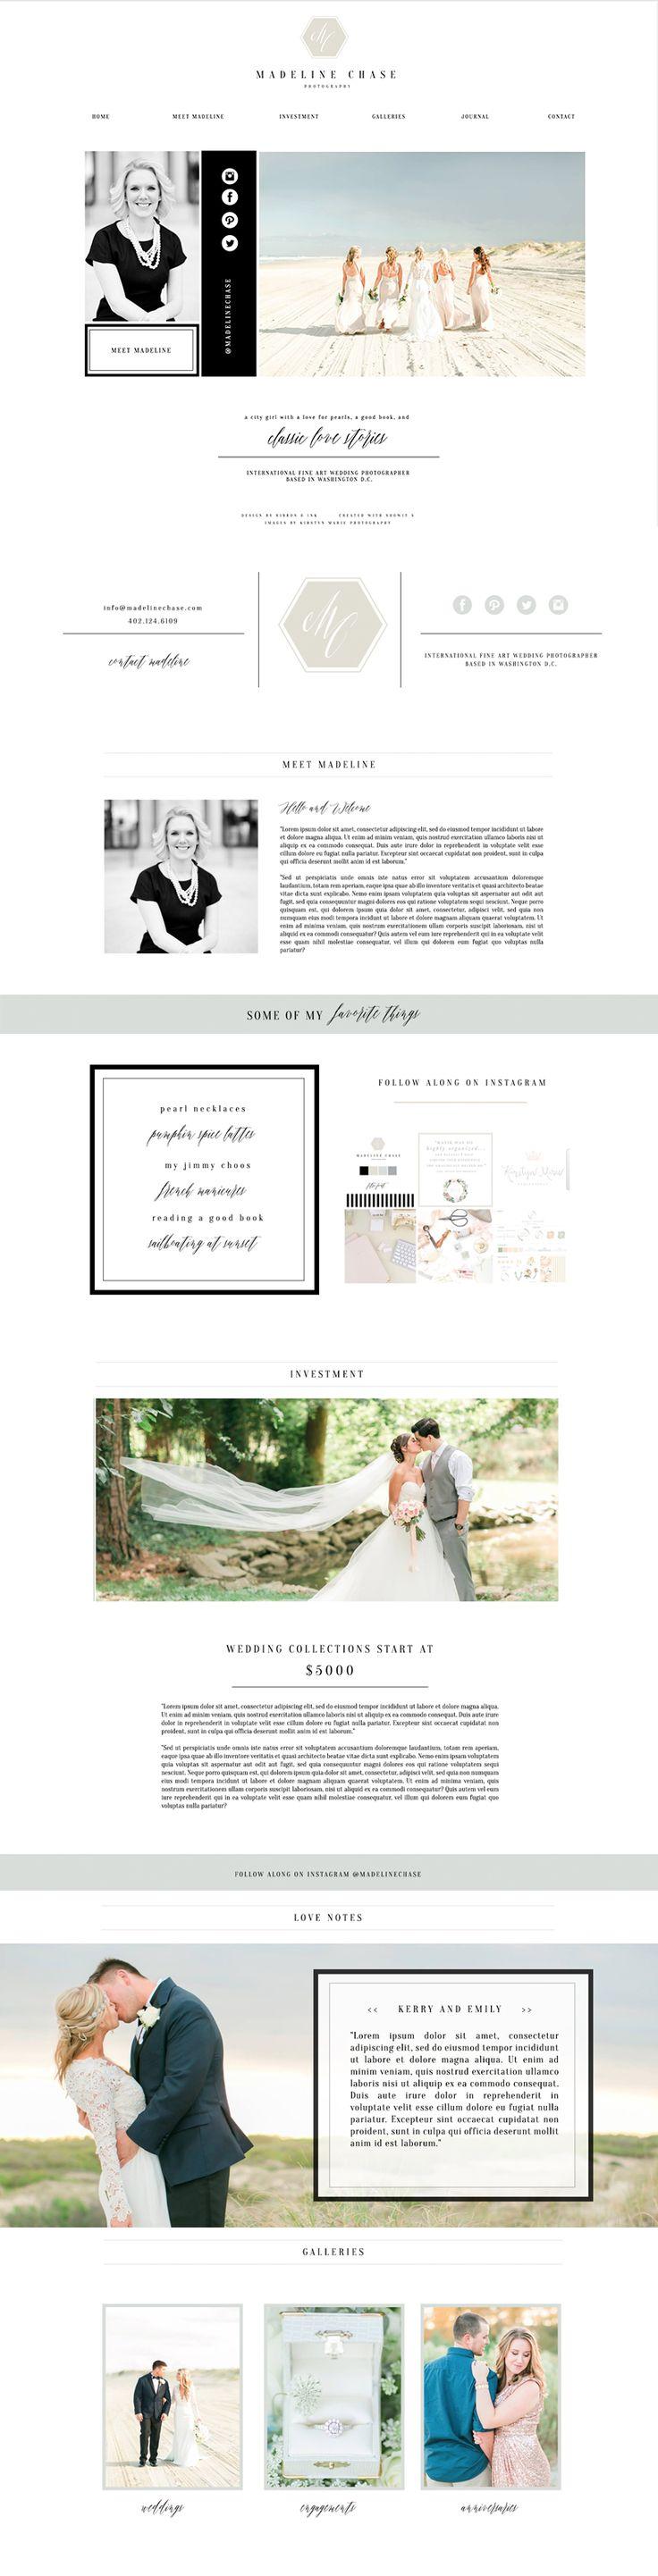 showit5-website-template-for-photographers / web design / black and blue website / glam website / bold / branding